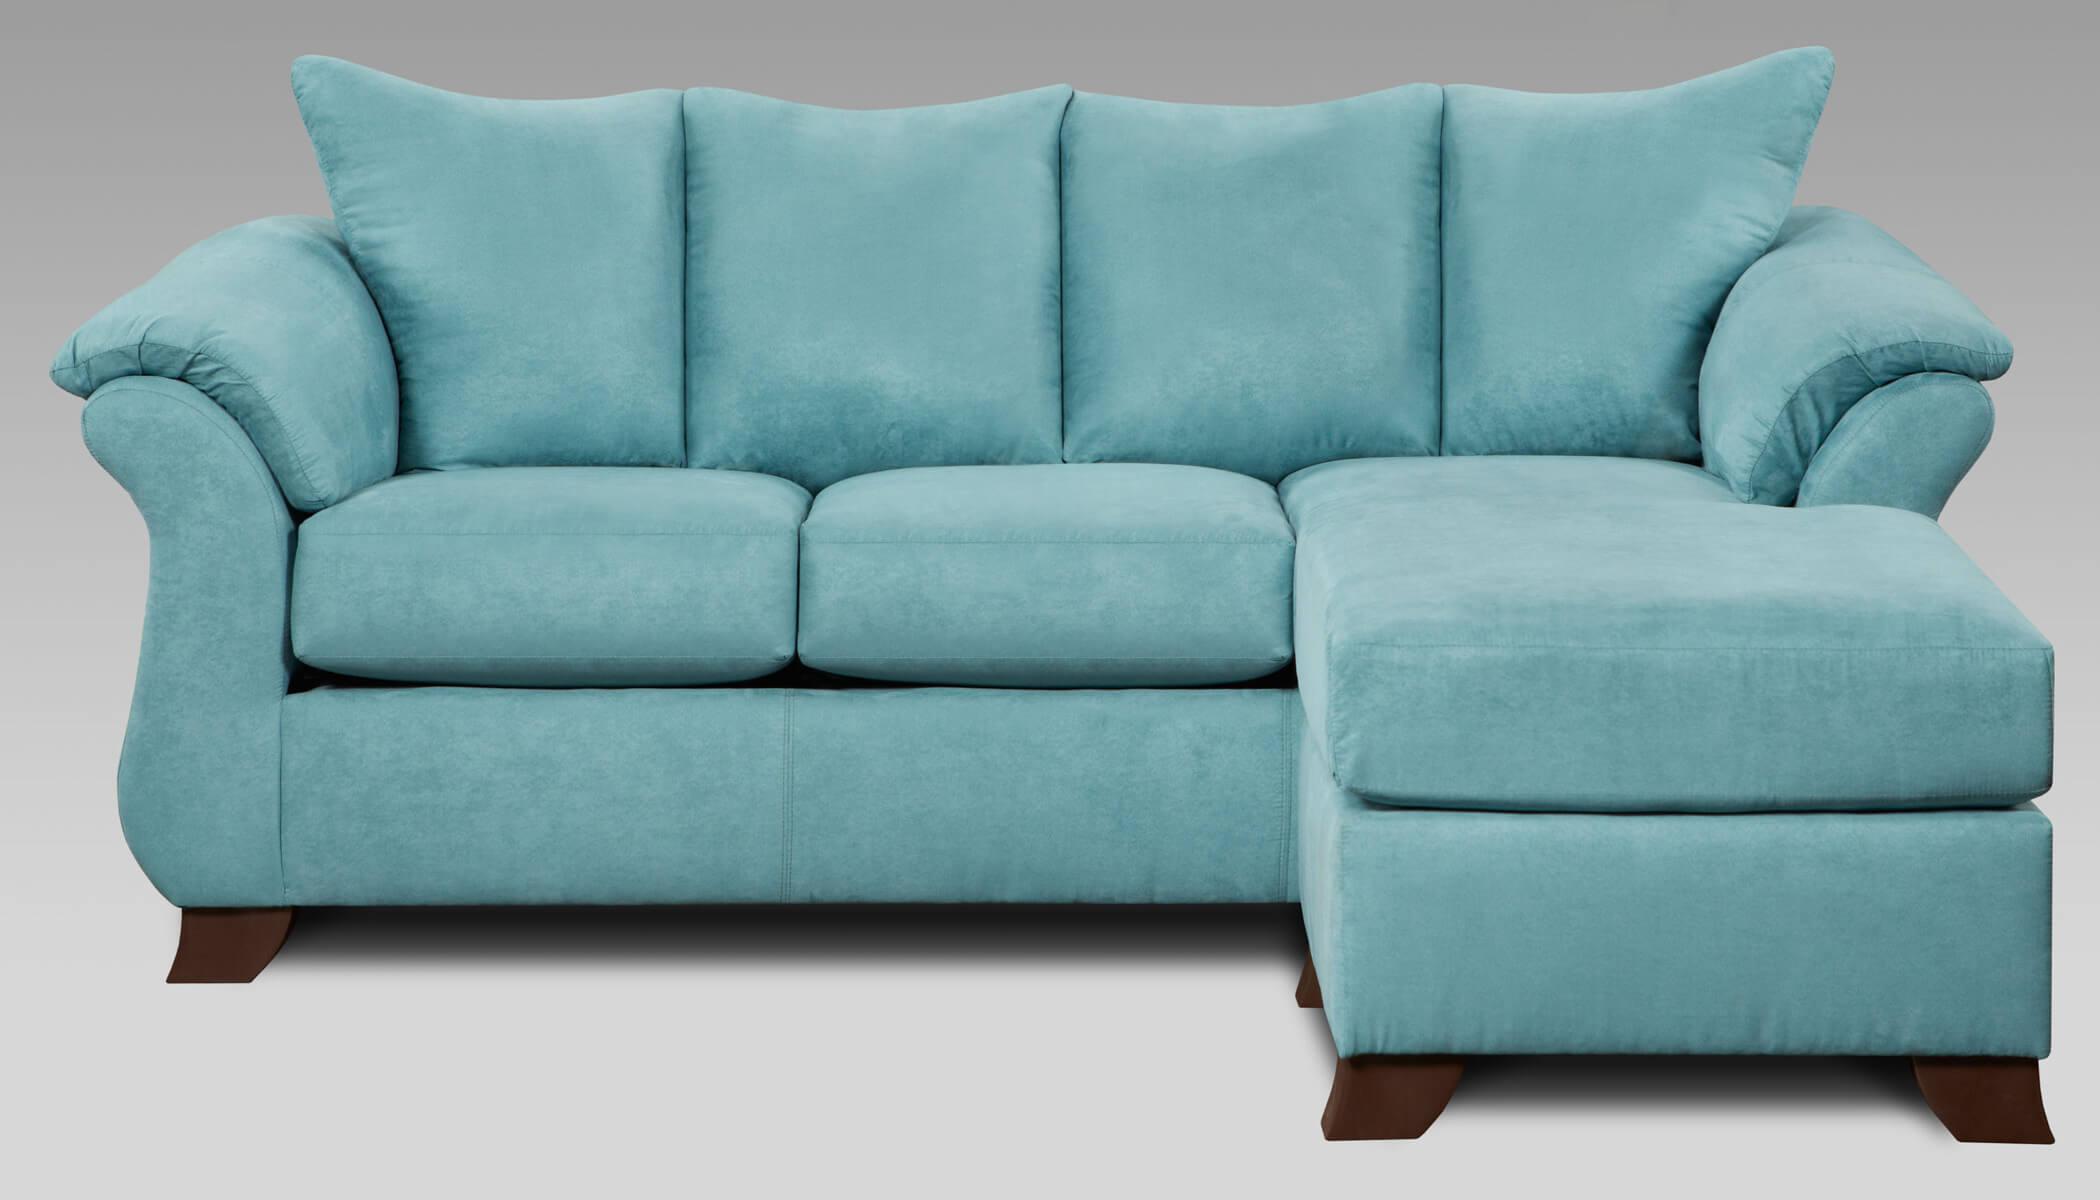 Sensations Capri SofaChaise Sectional Sofa Sets